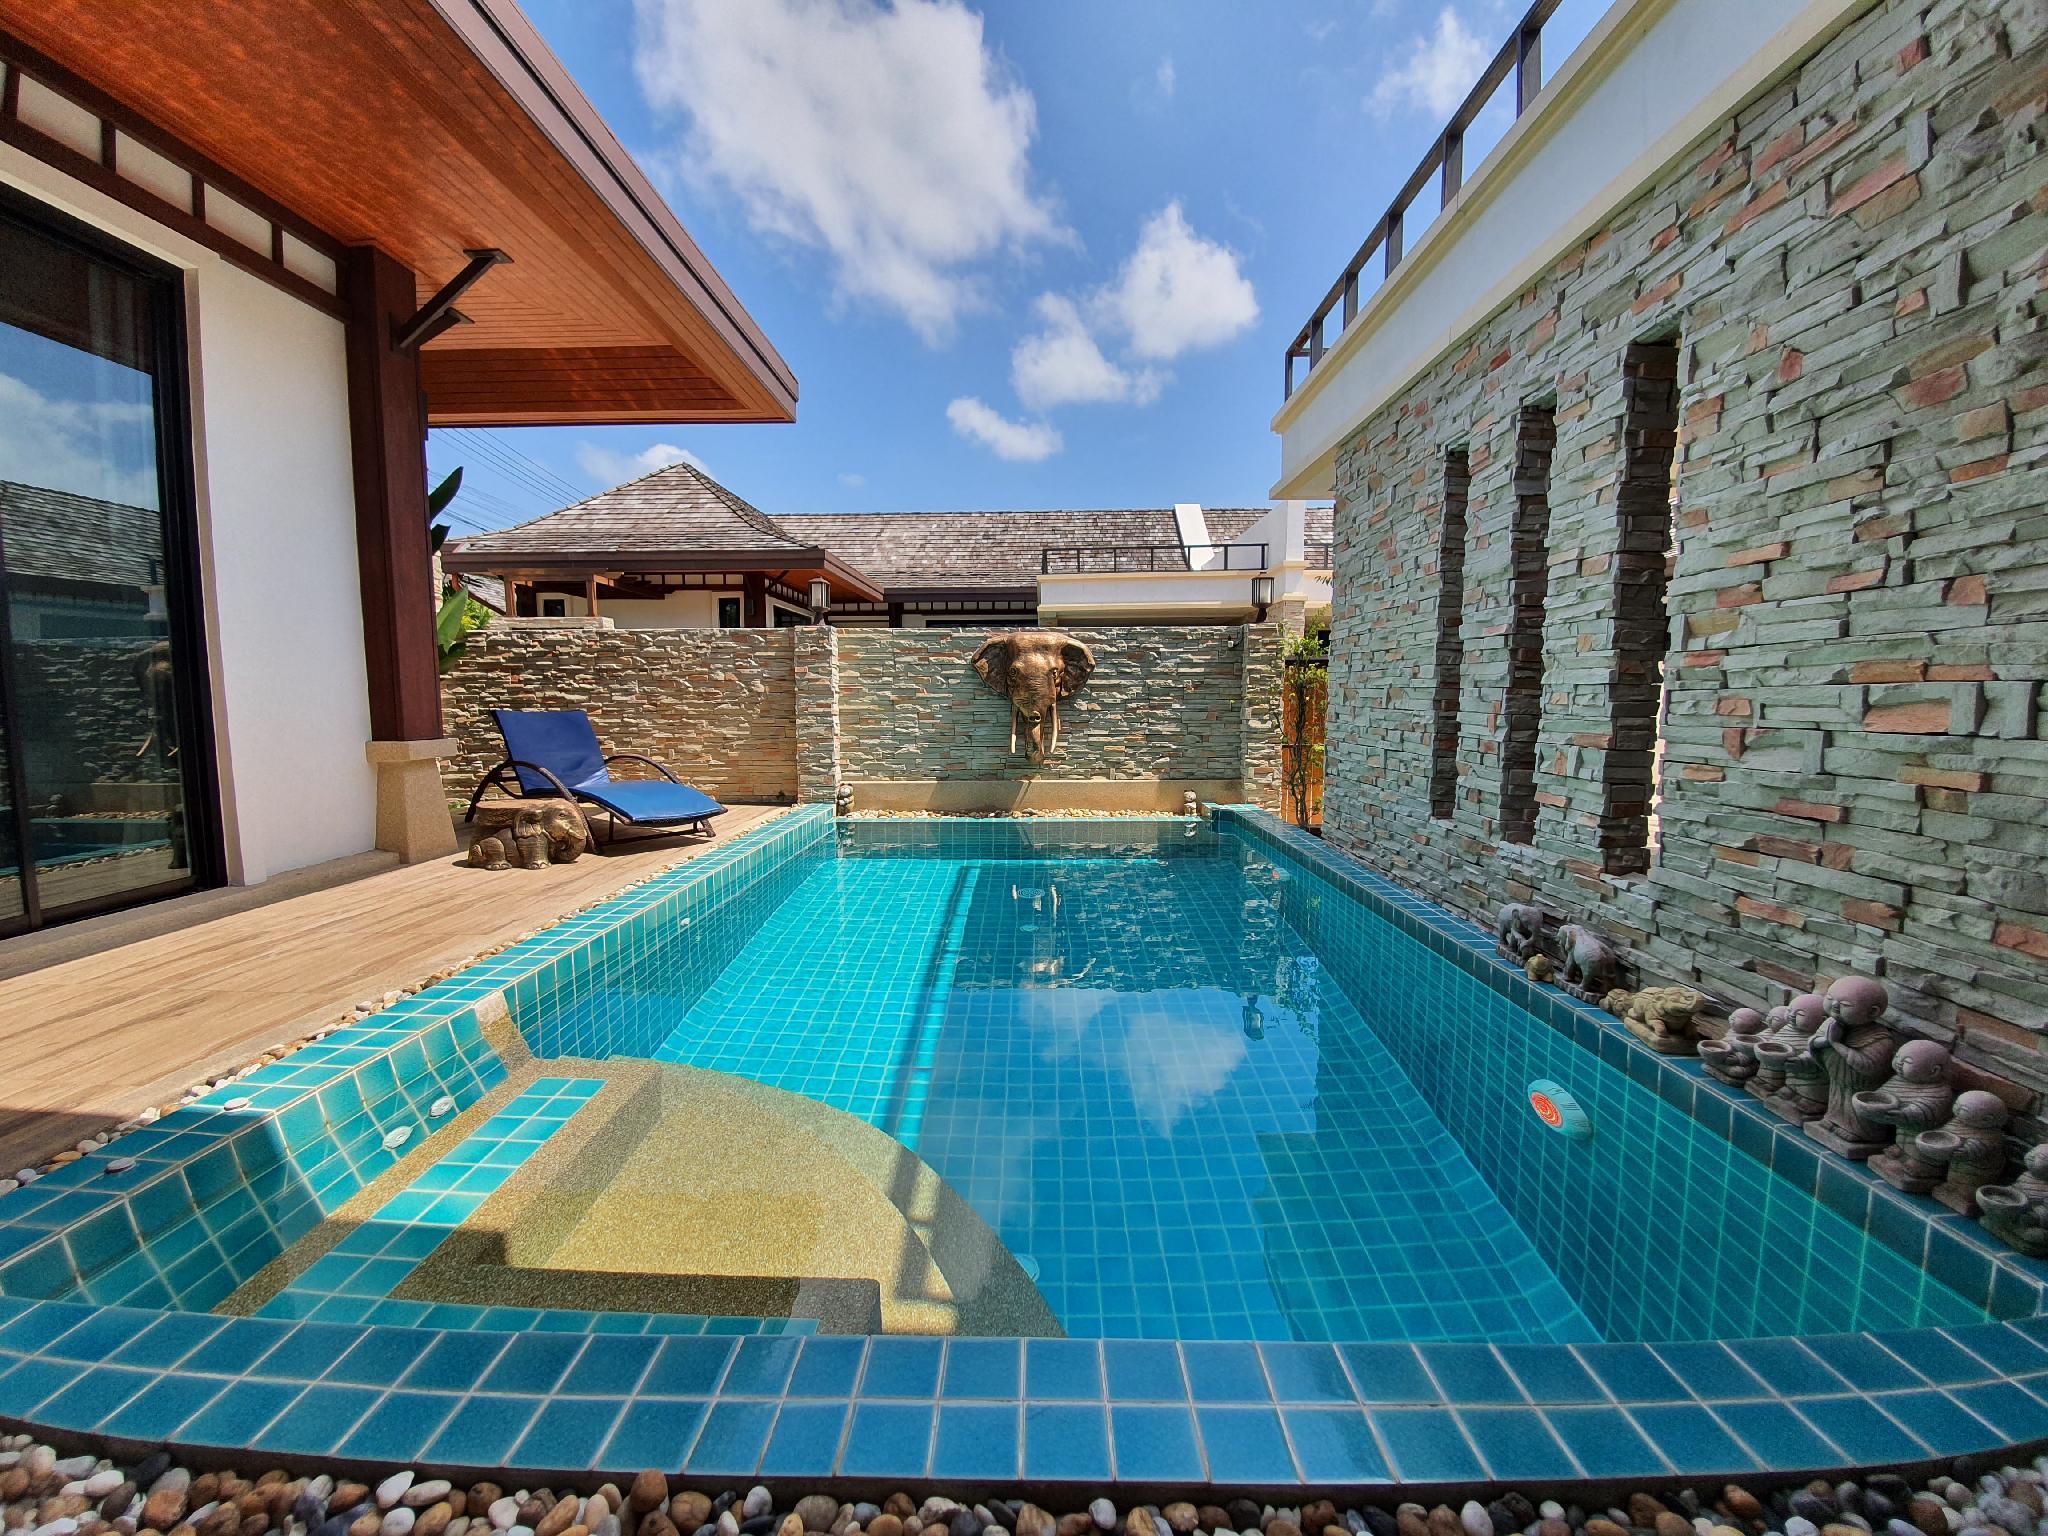 Rawai Beach, Simple style private villa with pool วิลลา 2 ห้องนอน 3 ห้องน้ำส่วนตัว ขนาด 200 ตร.ม. – ฉลอง